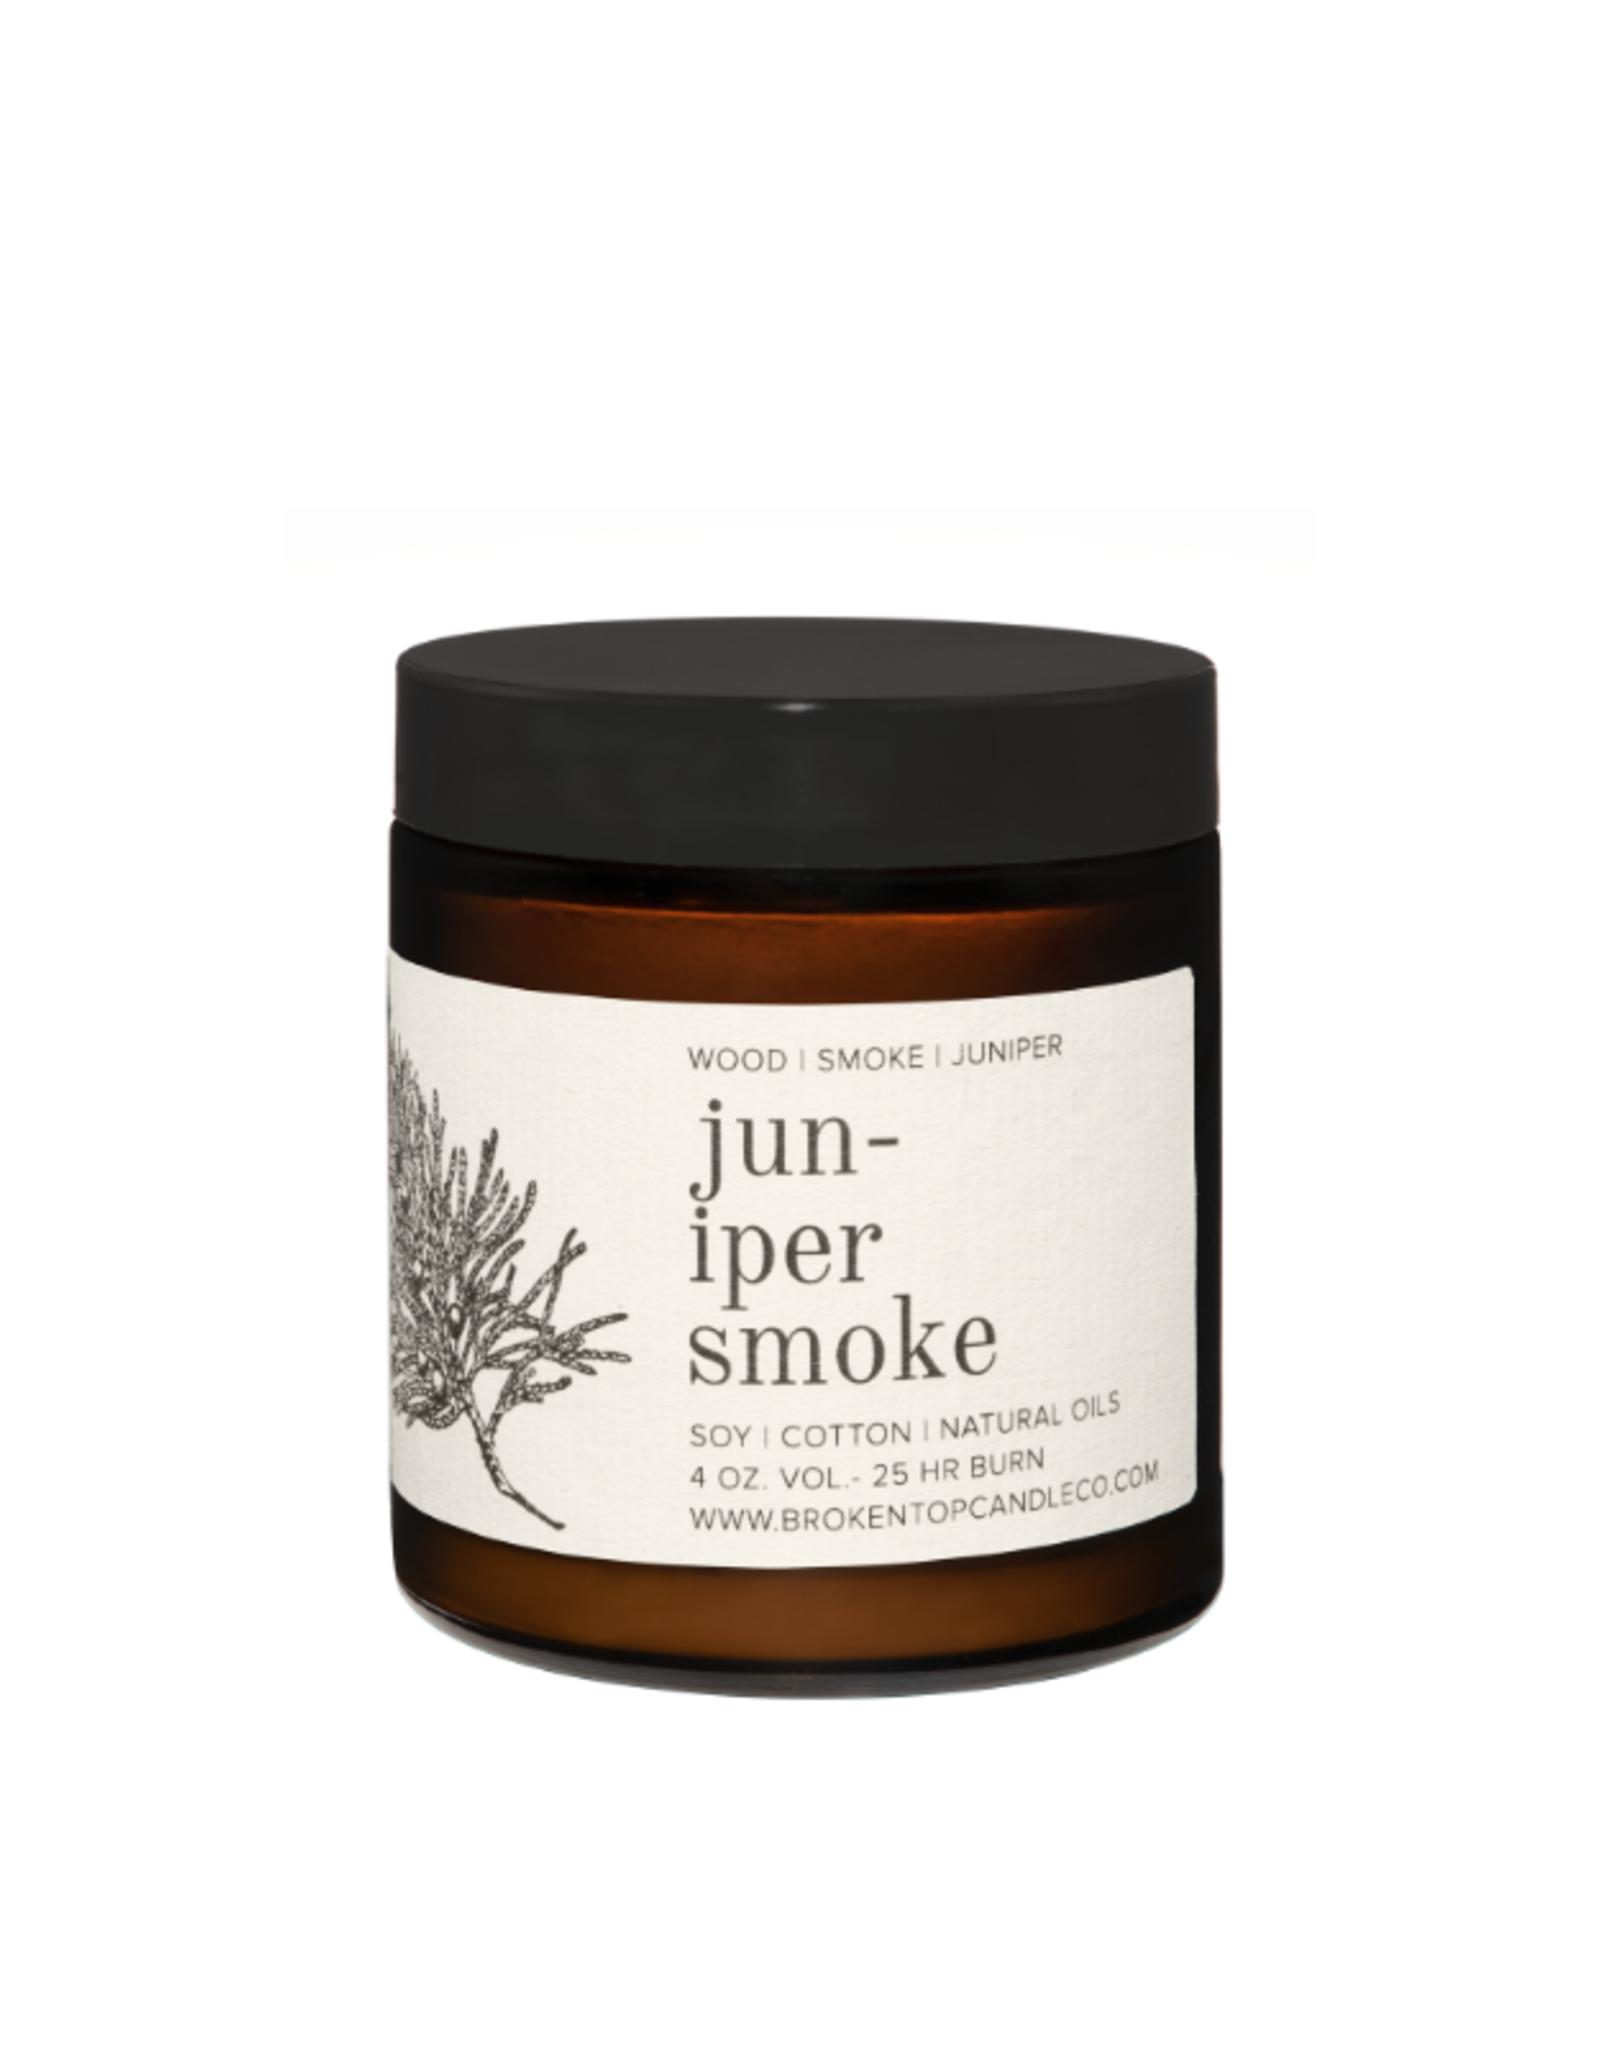 Broken Top Candle Bougie -Juniper smoke - 4oz